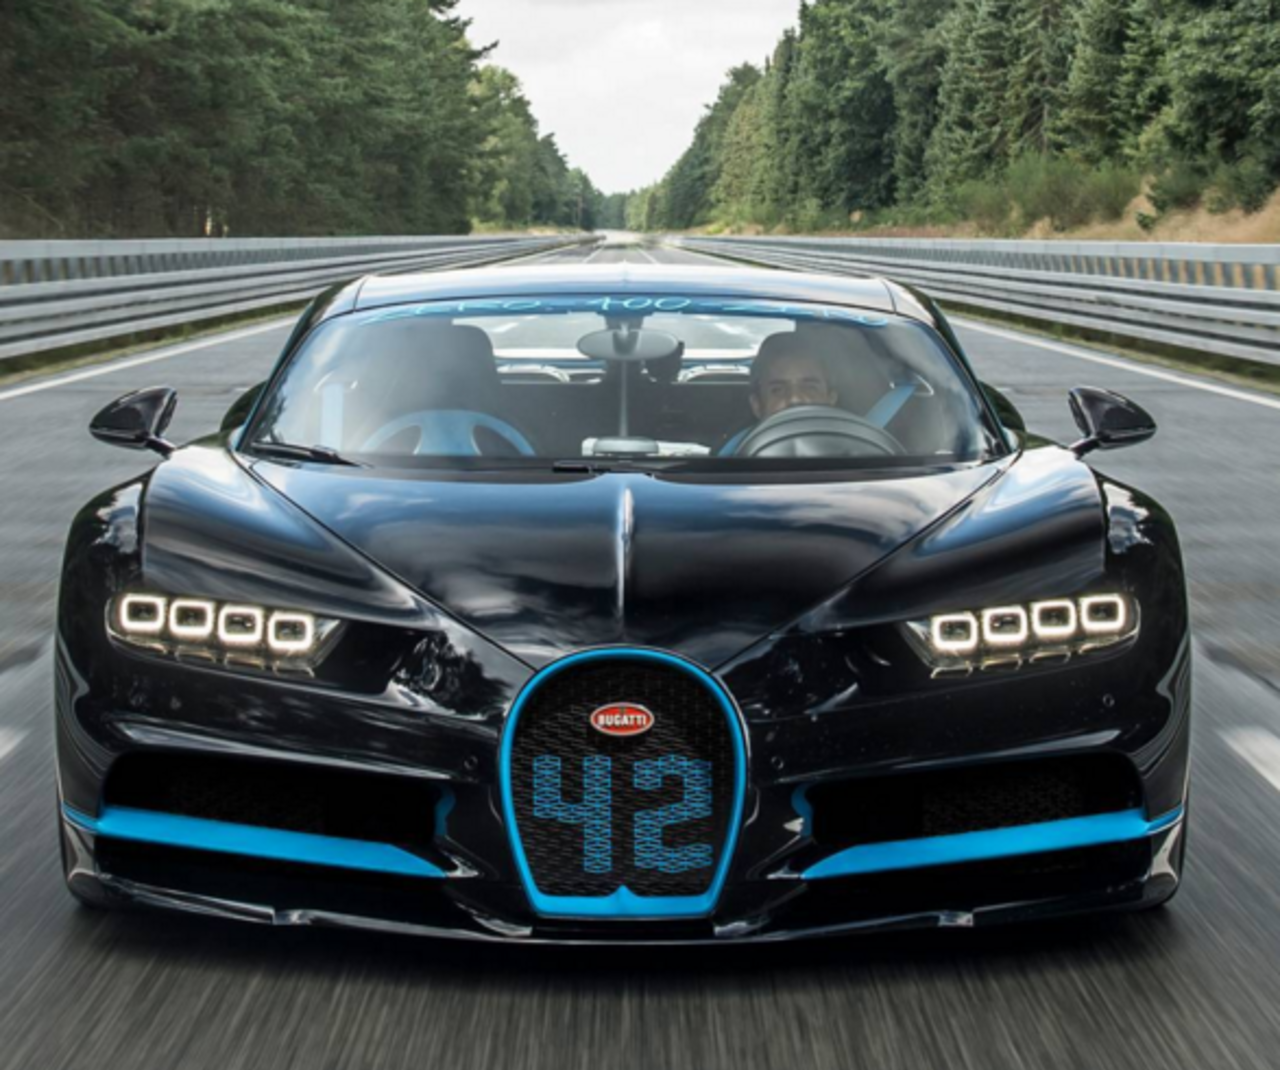 Колумбийский барон оседлал Bugatti Chiron